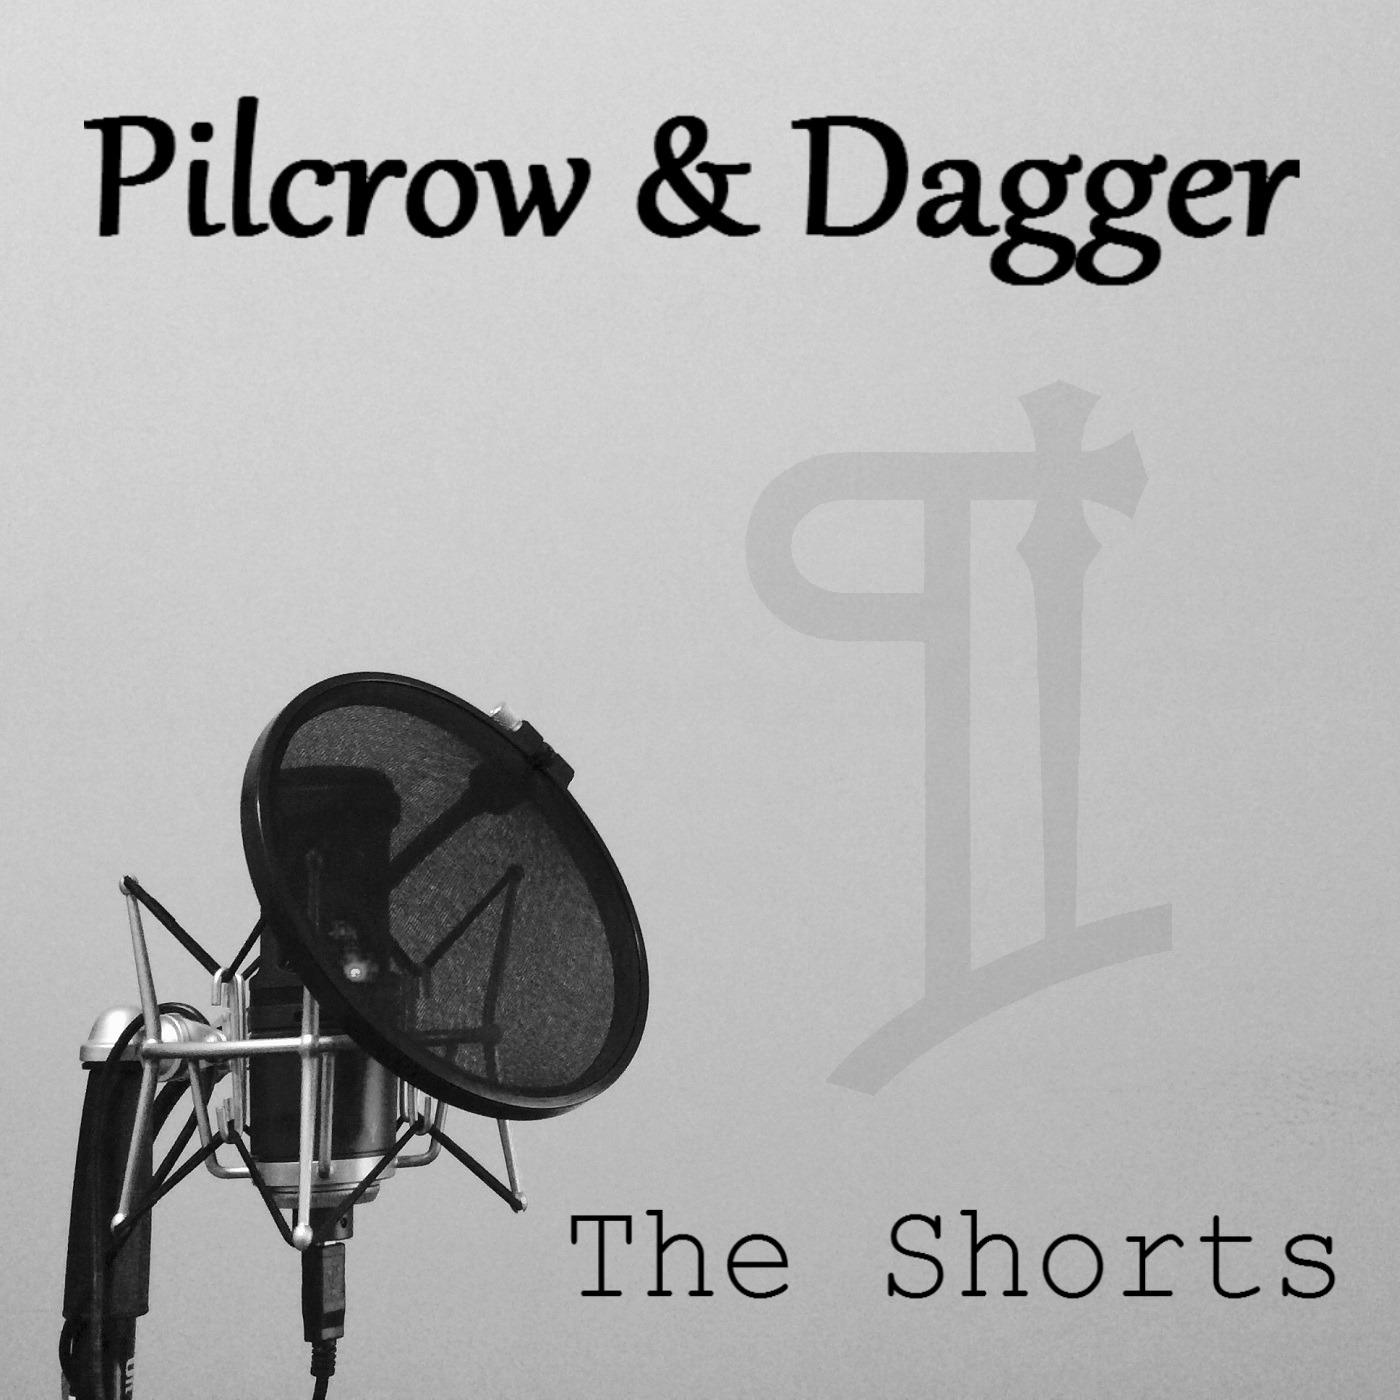 Pilcrow & Dagger: The Shorts